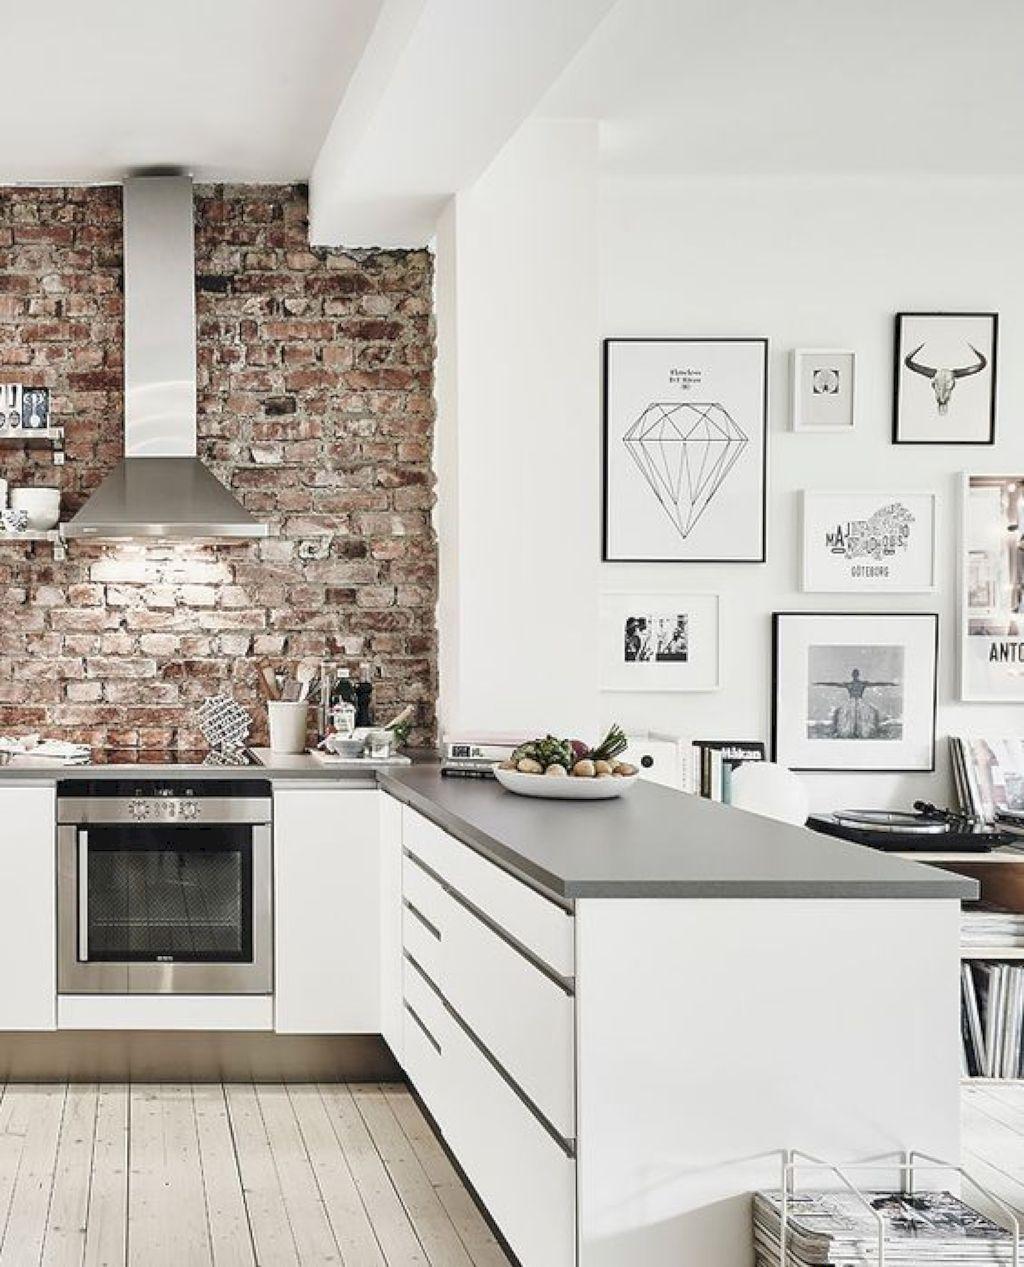 63 Gorgeous Modern Scandinavian Kitchen Ideas | Kitchens, Modern and ...